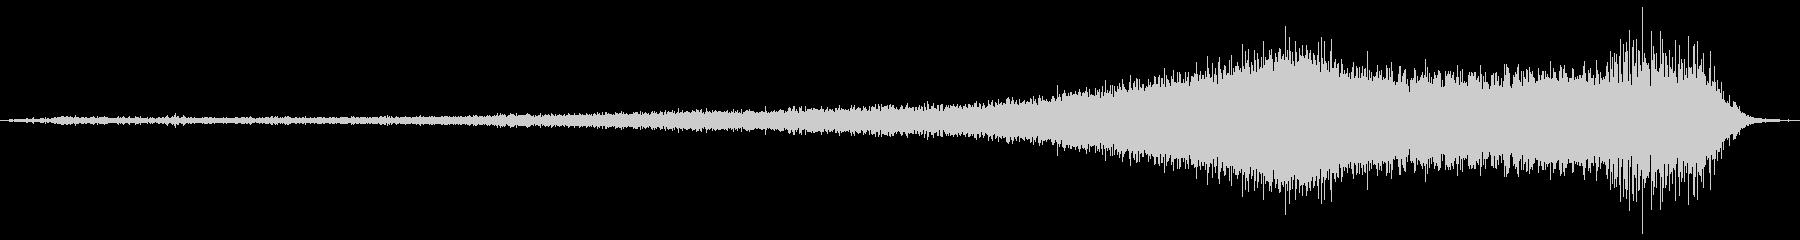 CHEVELLE:EXT:アプロー...の未再生の波形